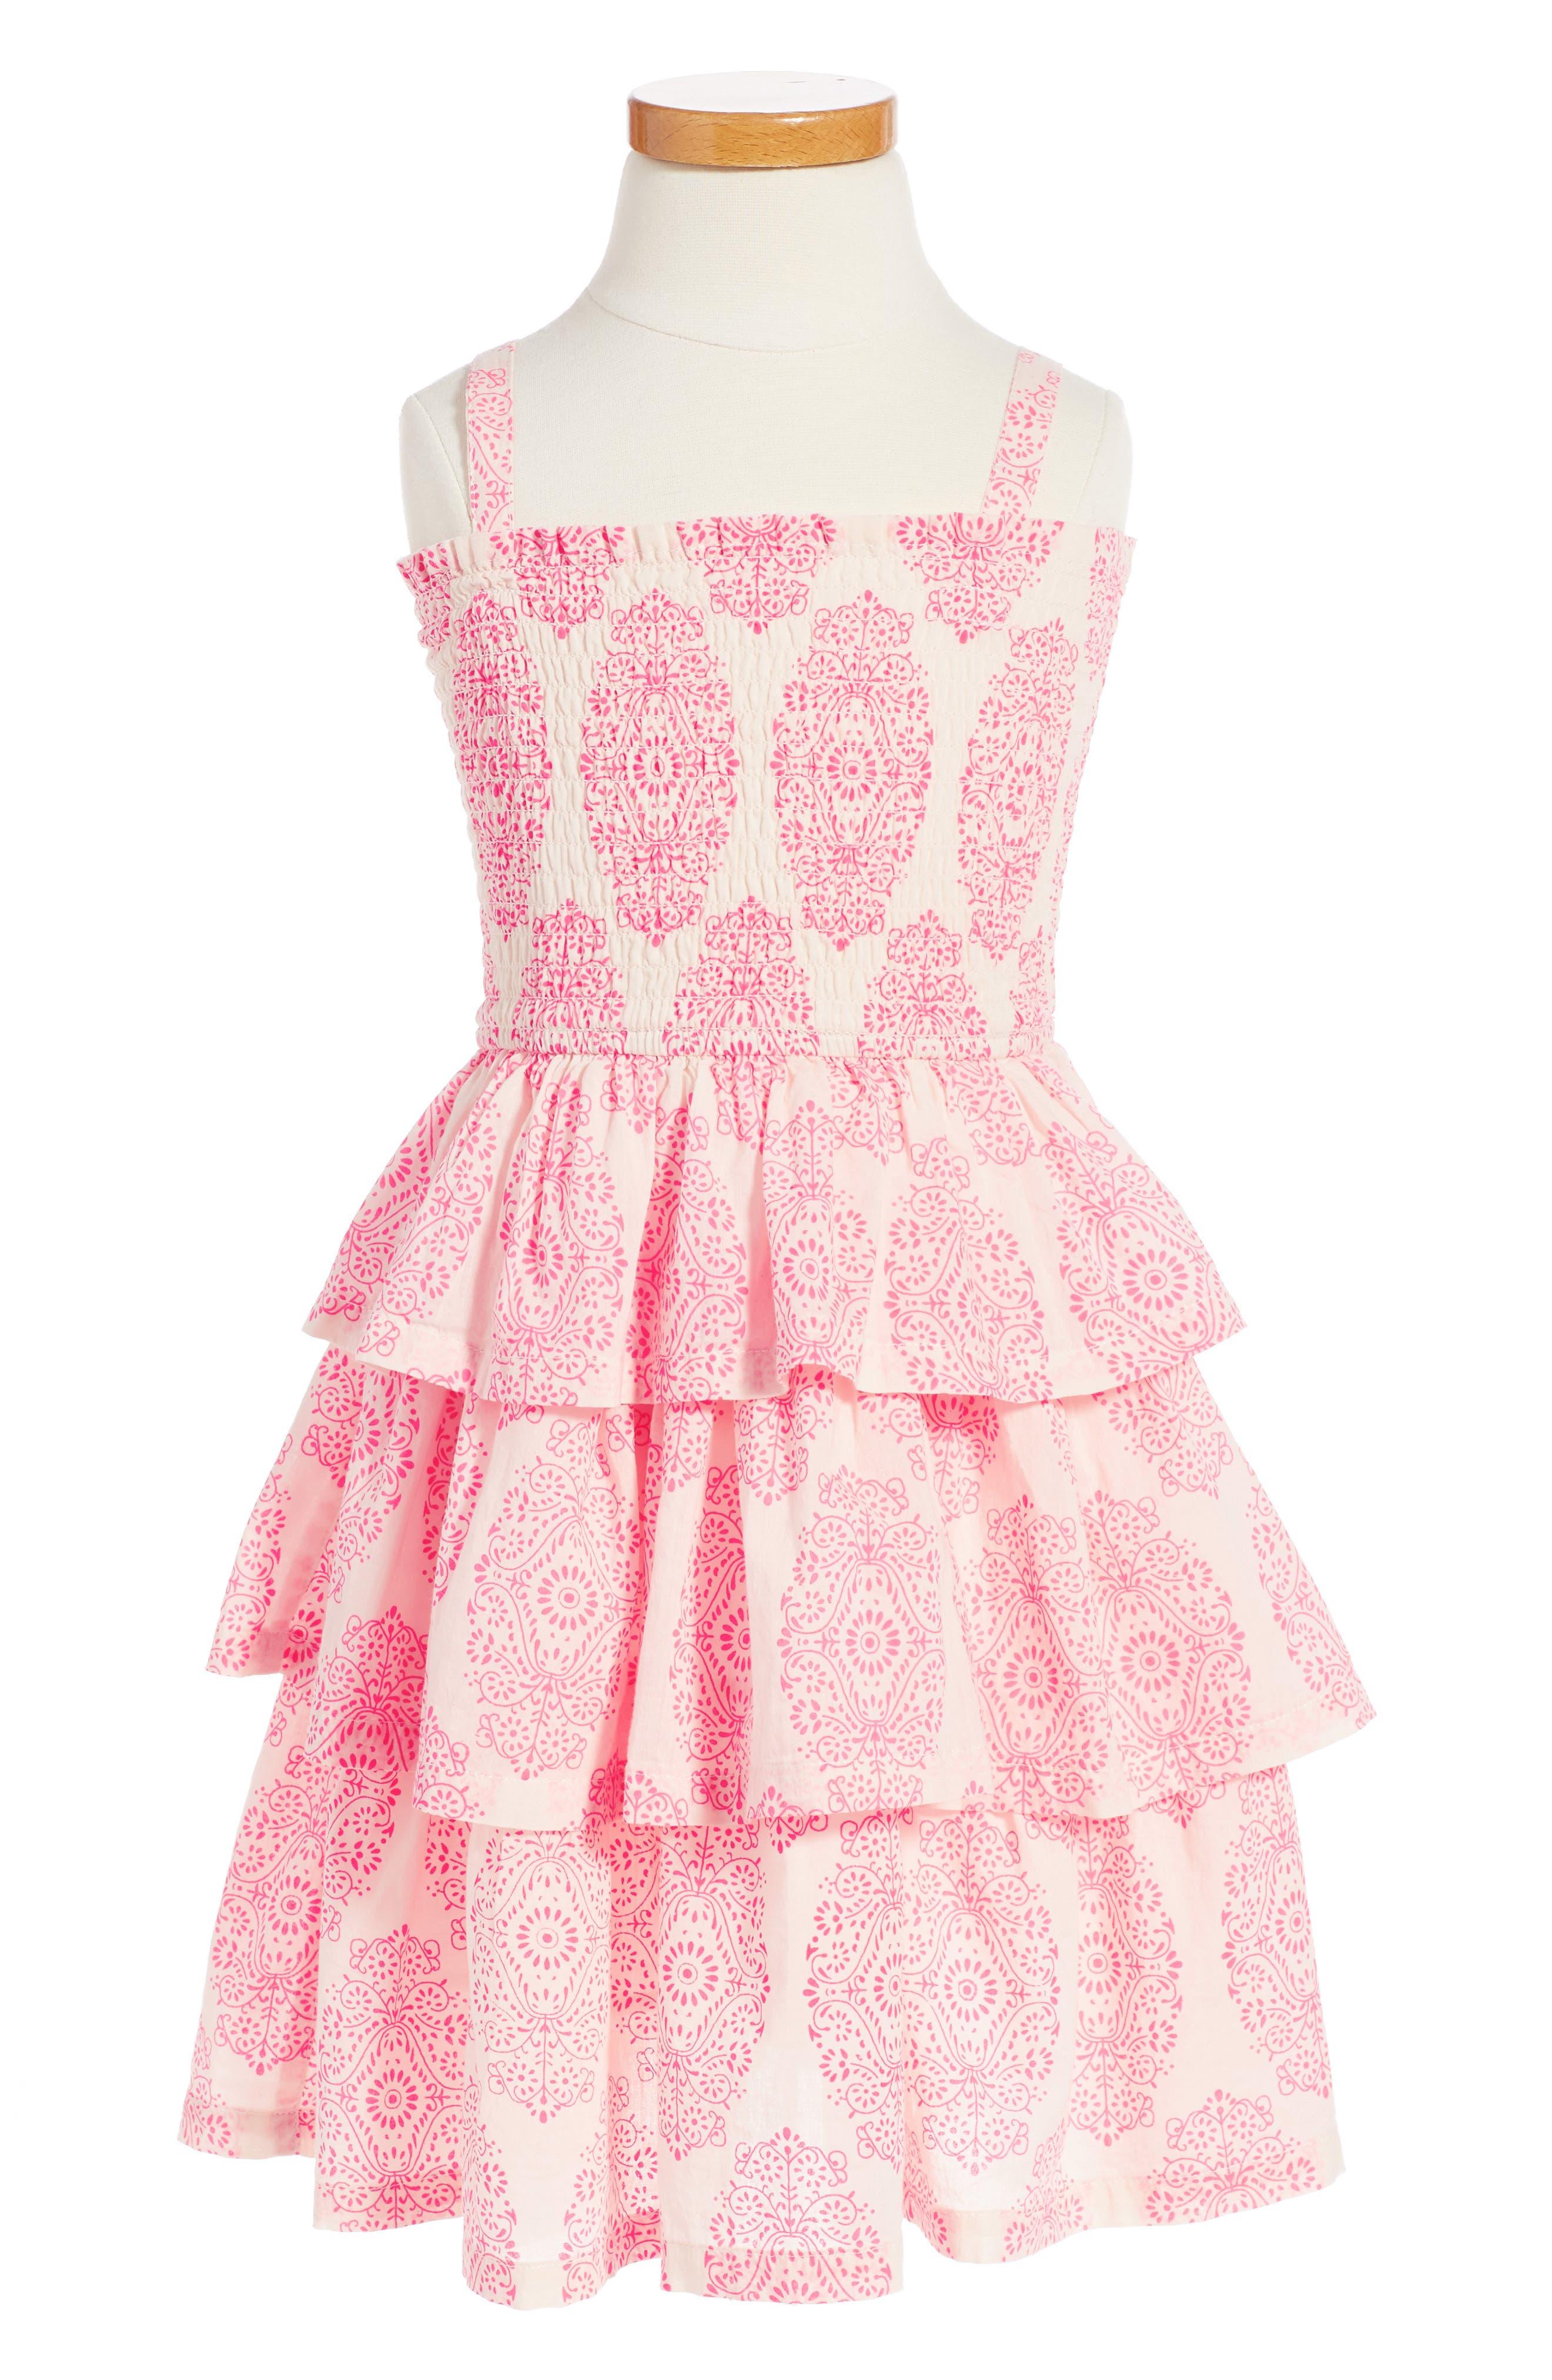 Sadie Print Smocked Sundress,                         Main,                         color, Hot Pink